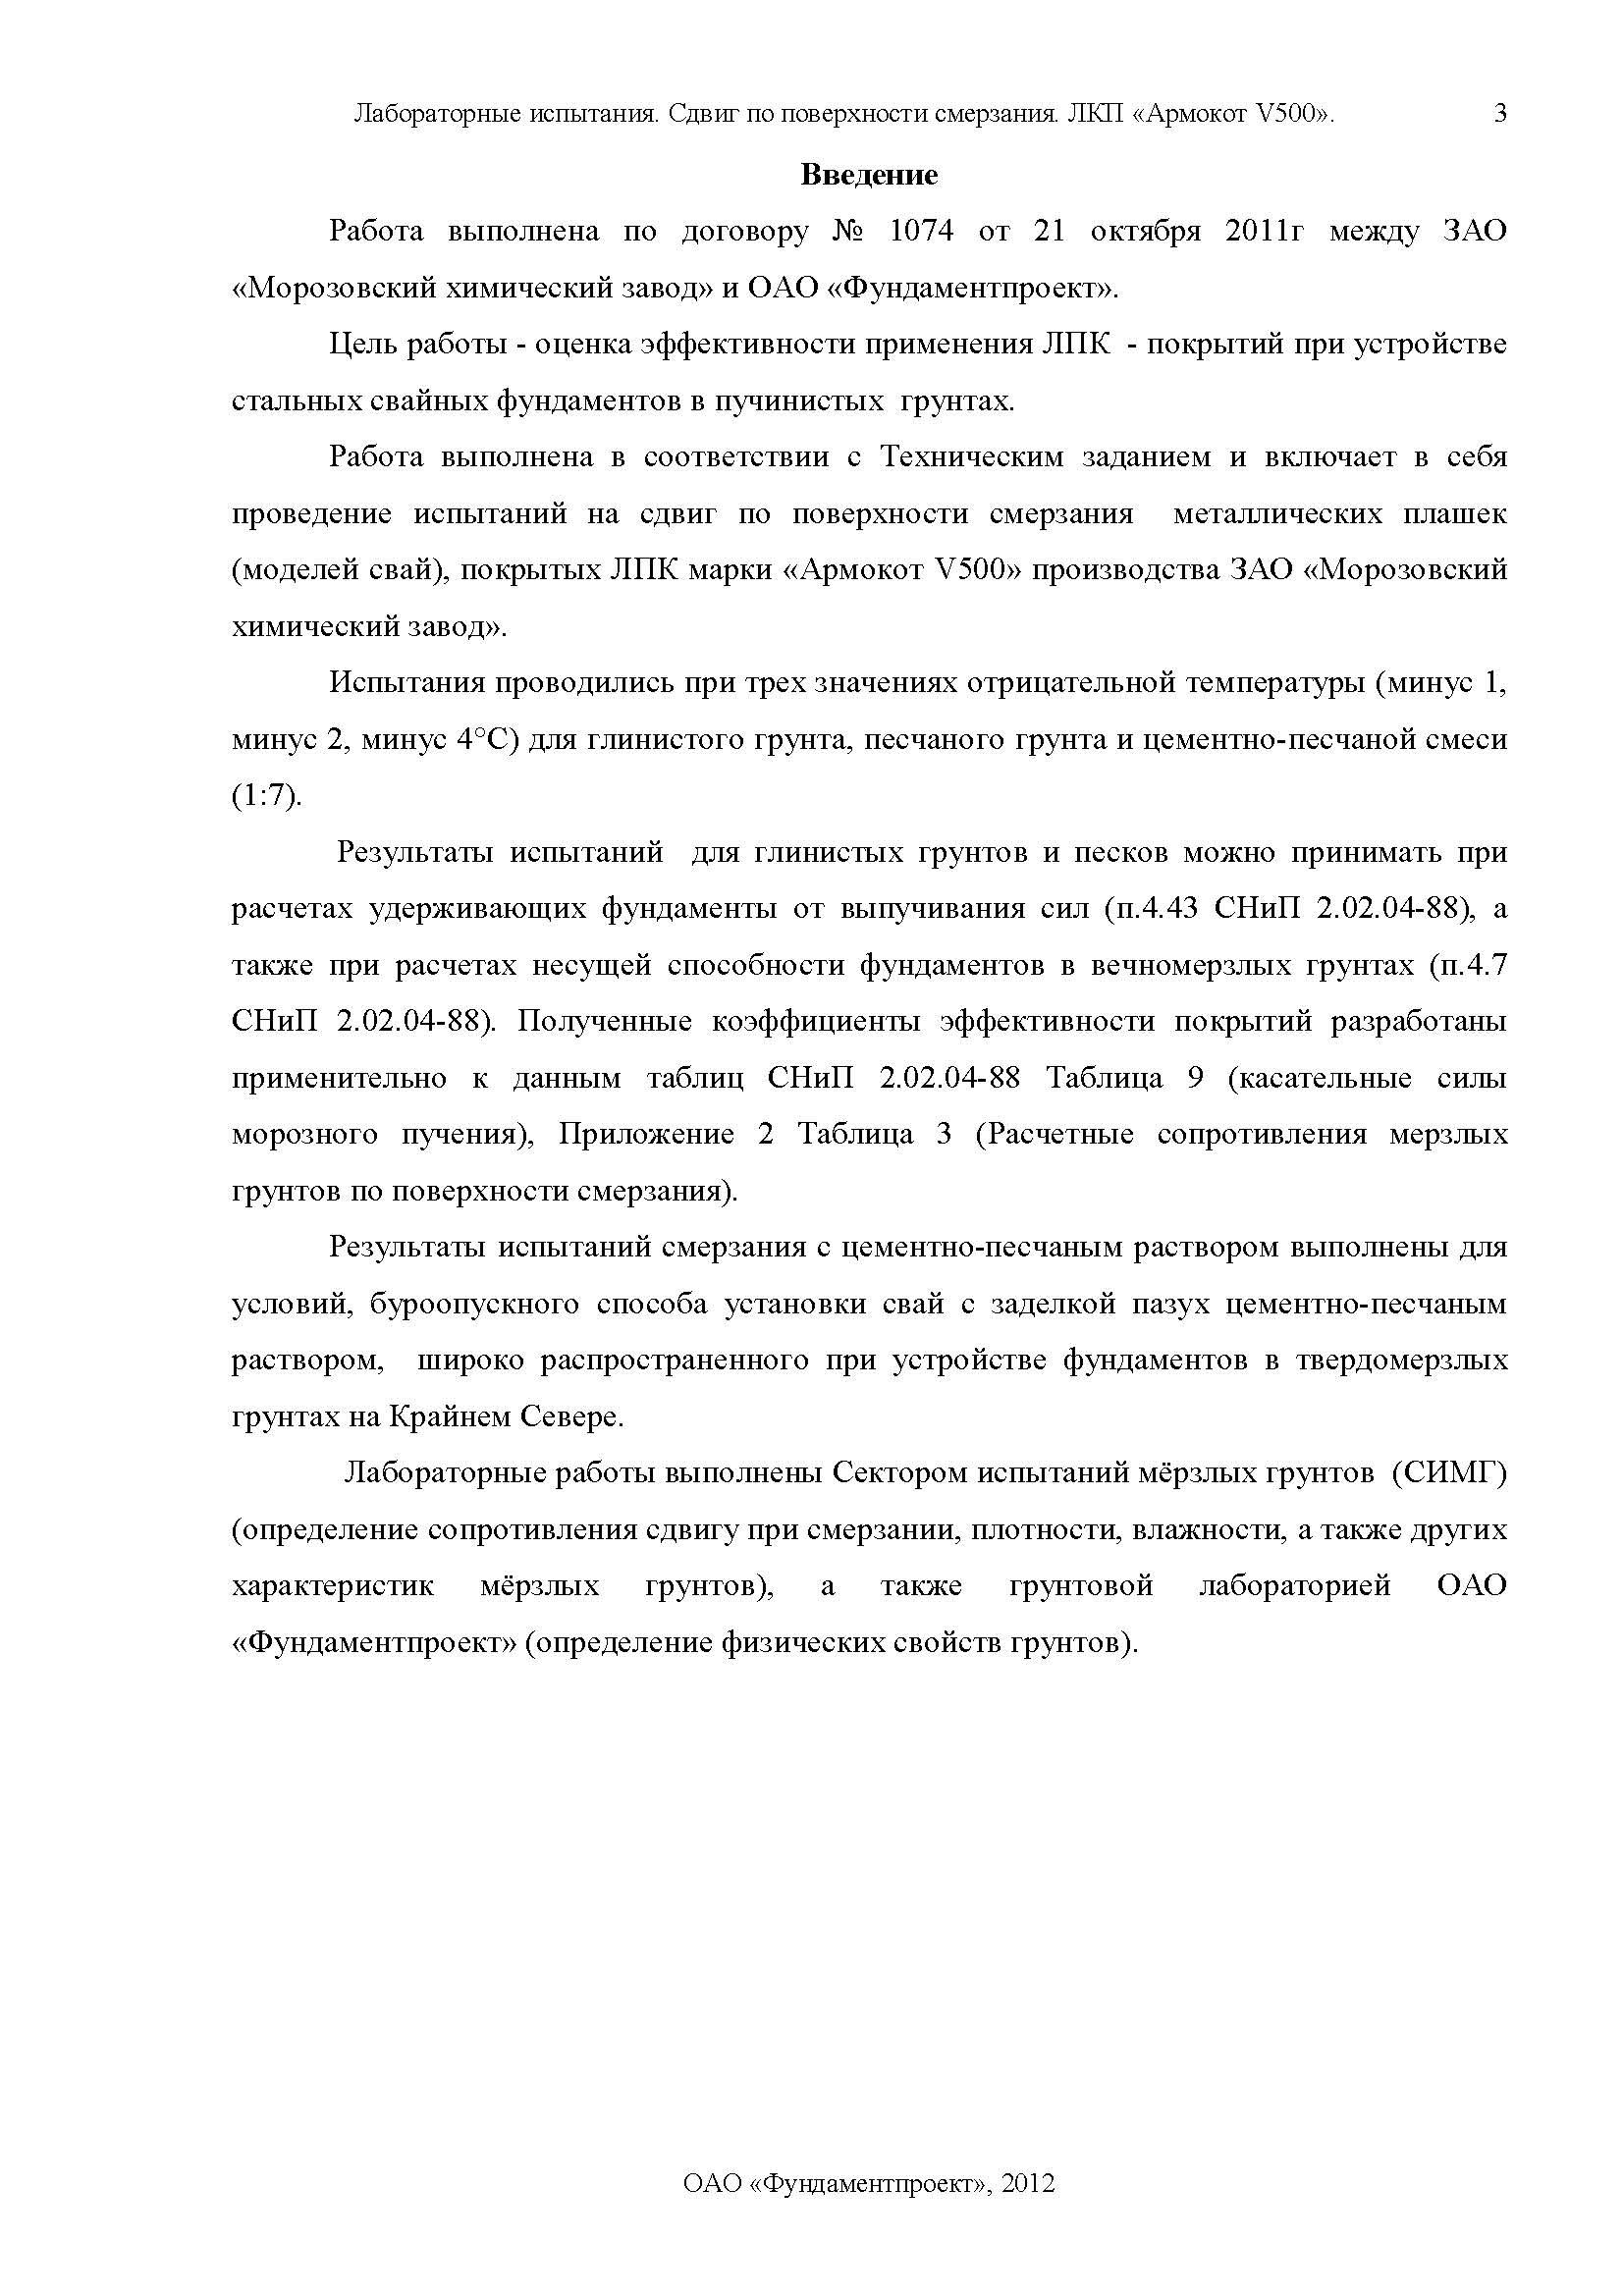 Отчет по сваям Армокот V500 Фундаментпроект_Страница_03